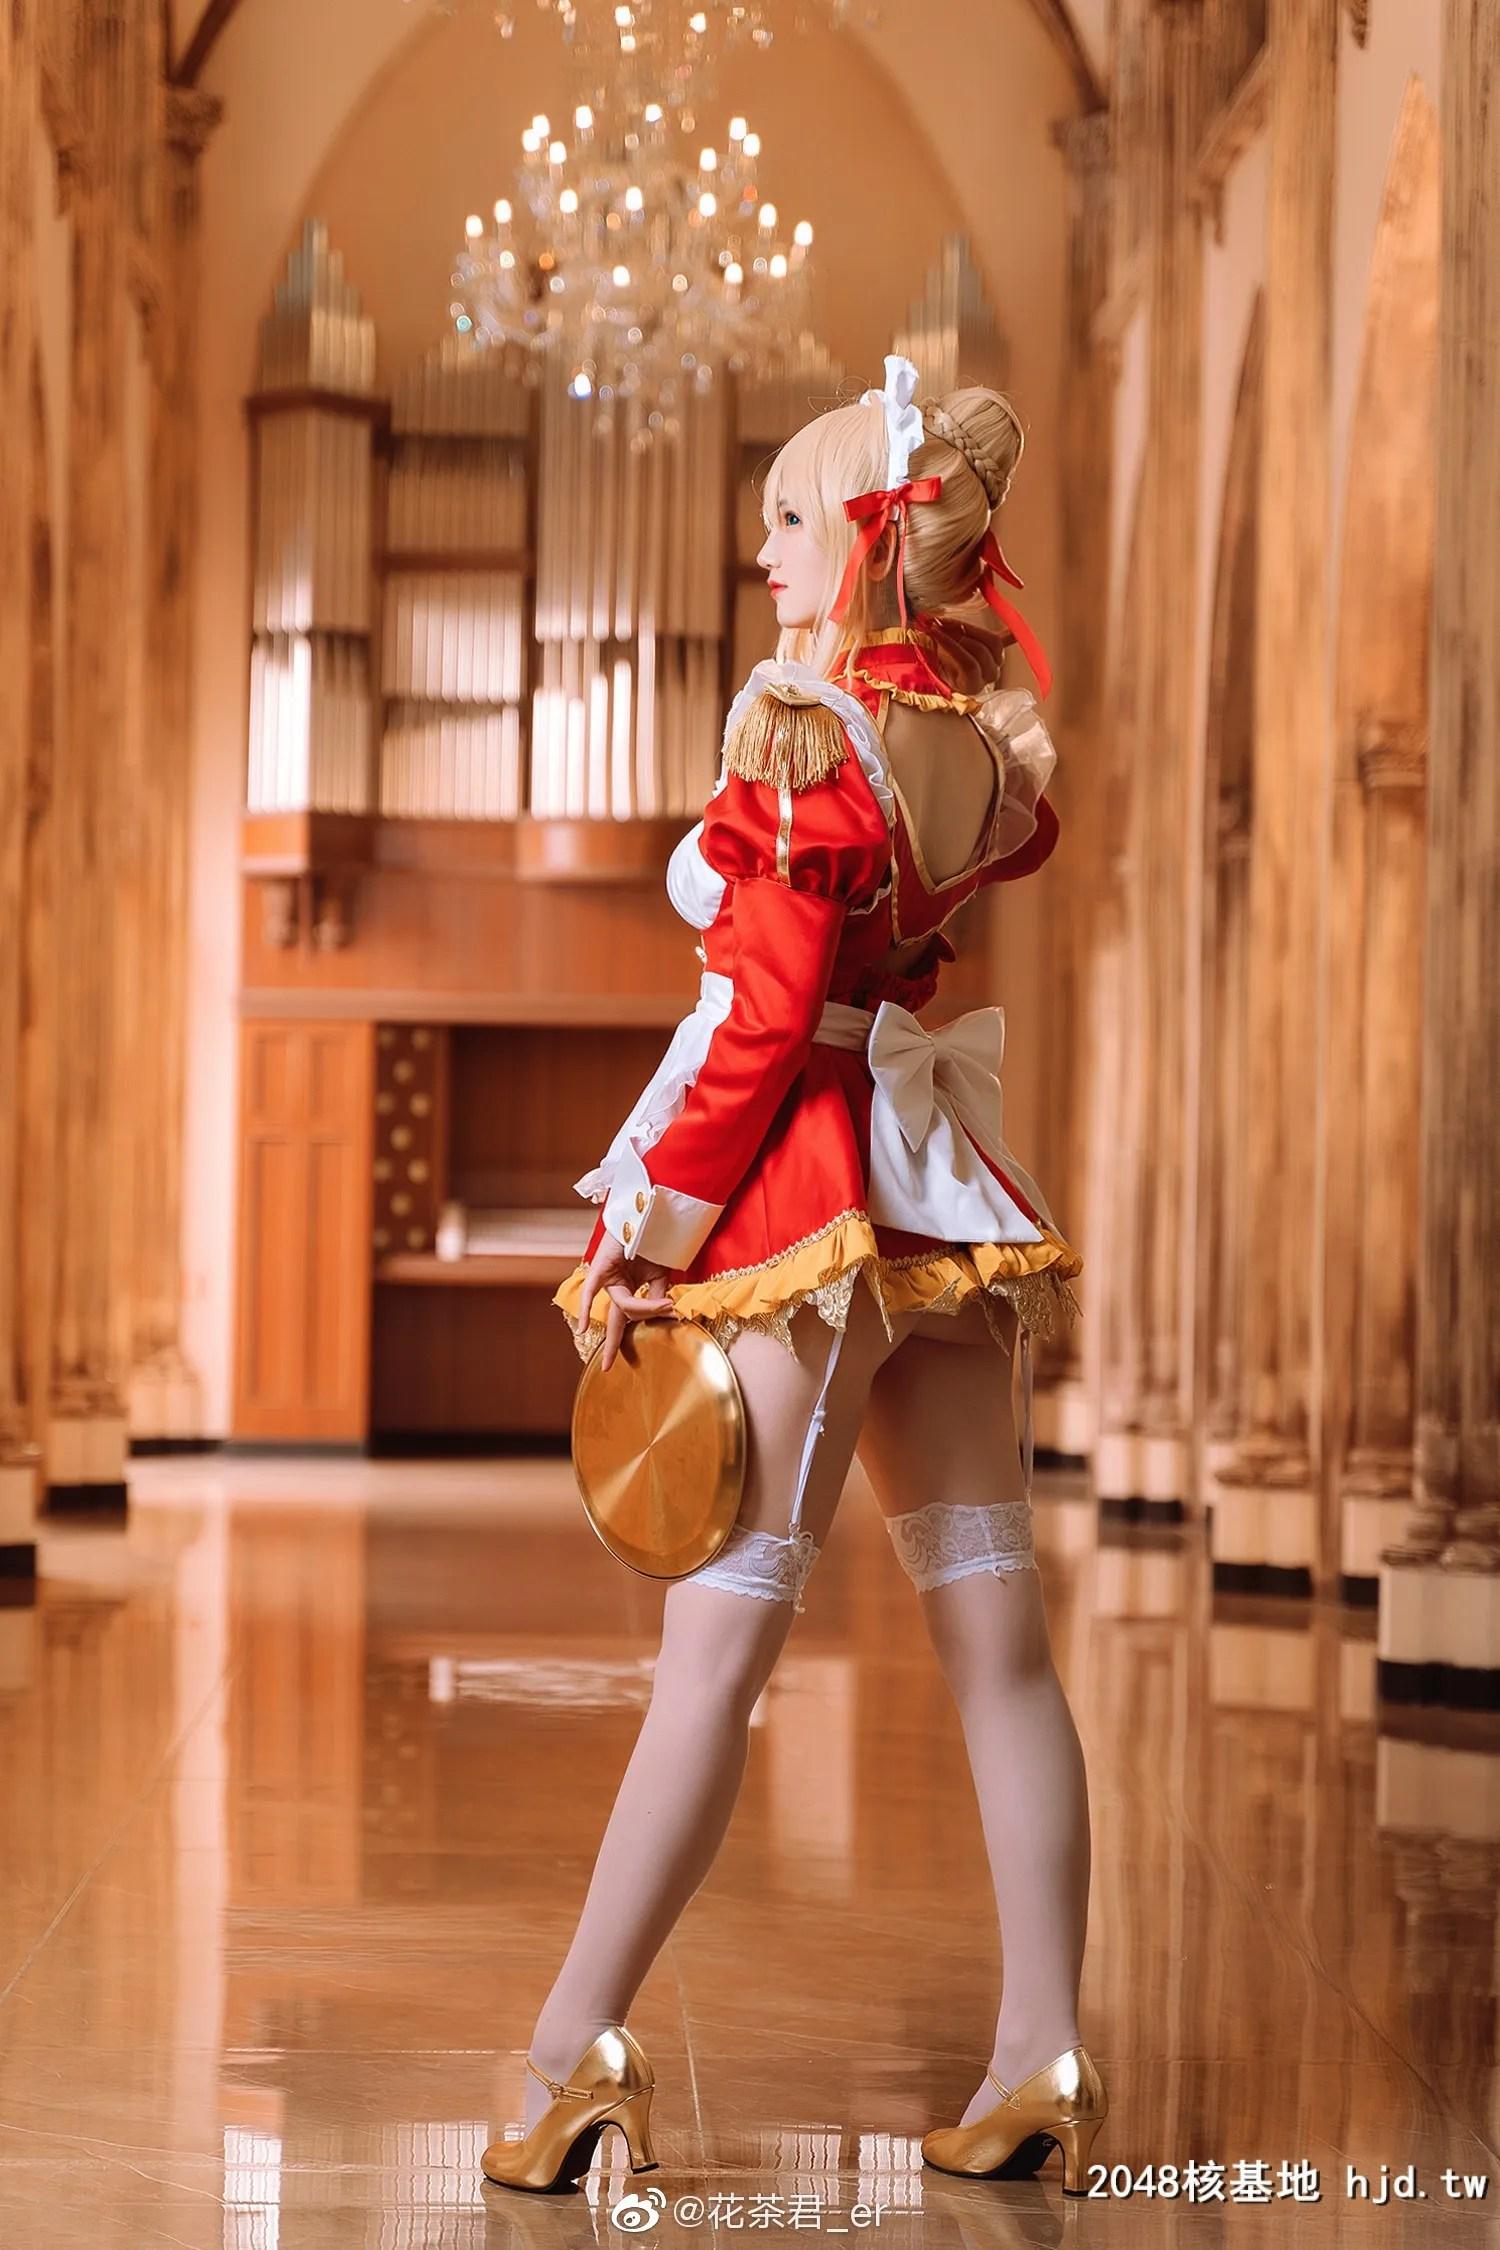 Fate/GrandOrder尼禄·克劳狄乌斯@花茶君_er (9P)插图(3)